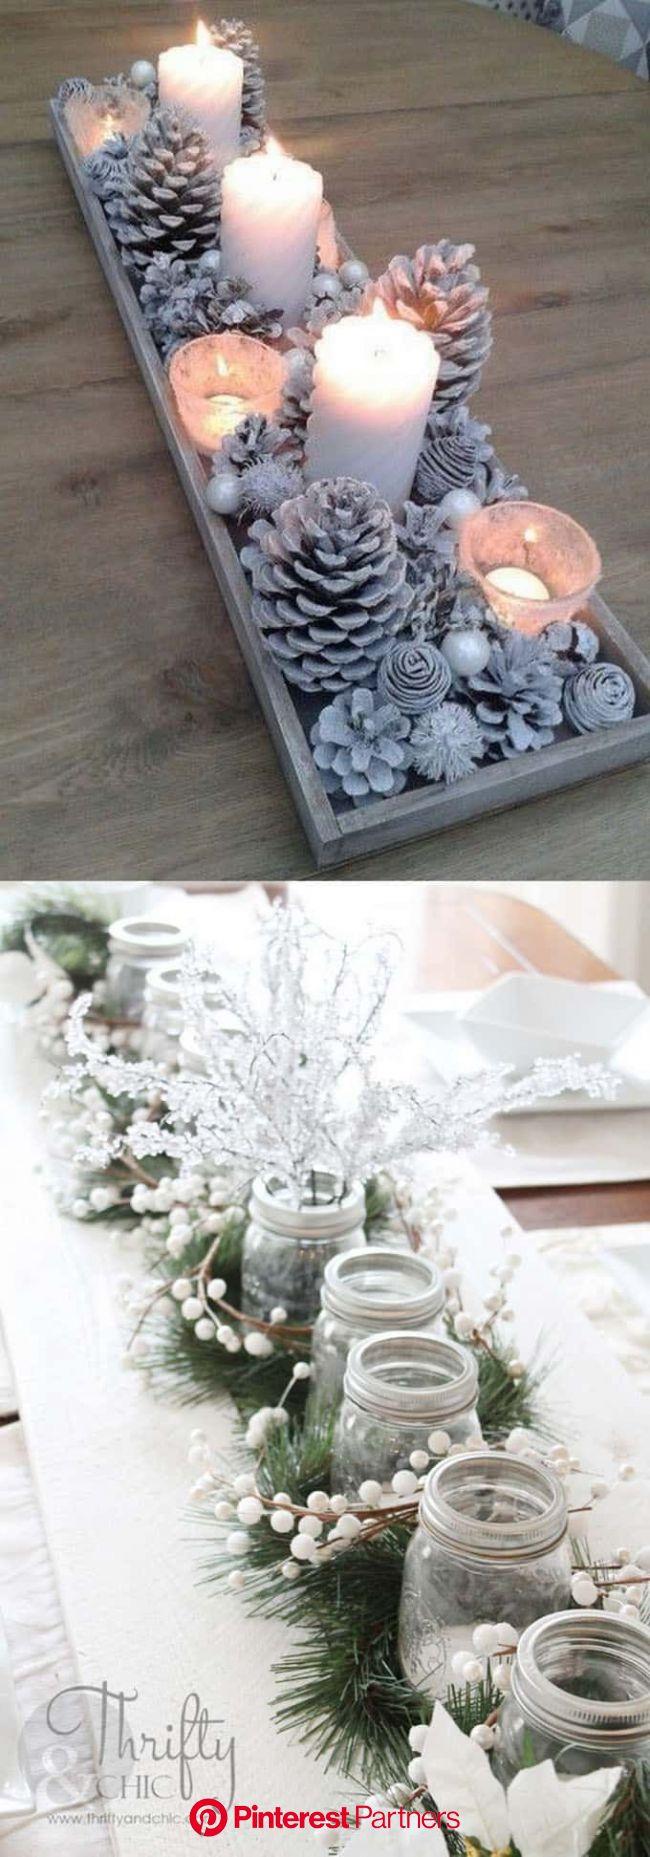 27 Gorgeous DIY Thanksgiving & Christmas Table Decorations & Centerpieces | Christmas table decorations centerpiece, Christmas centerpieces, C